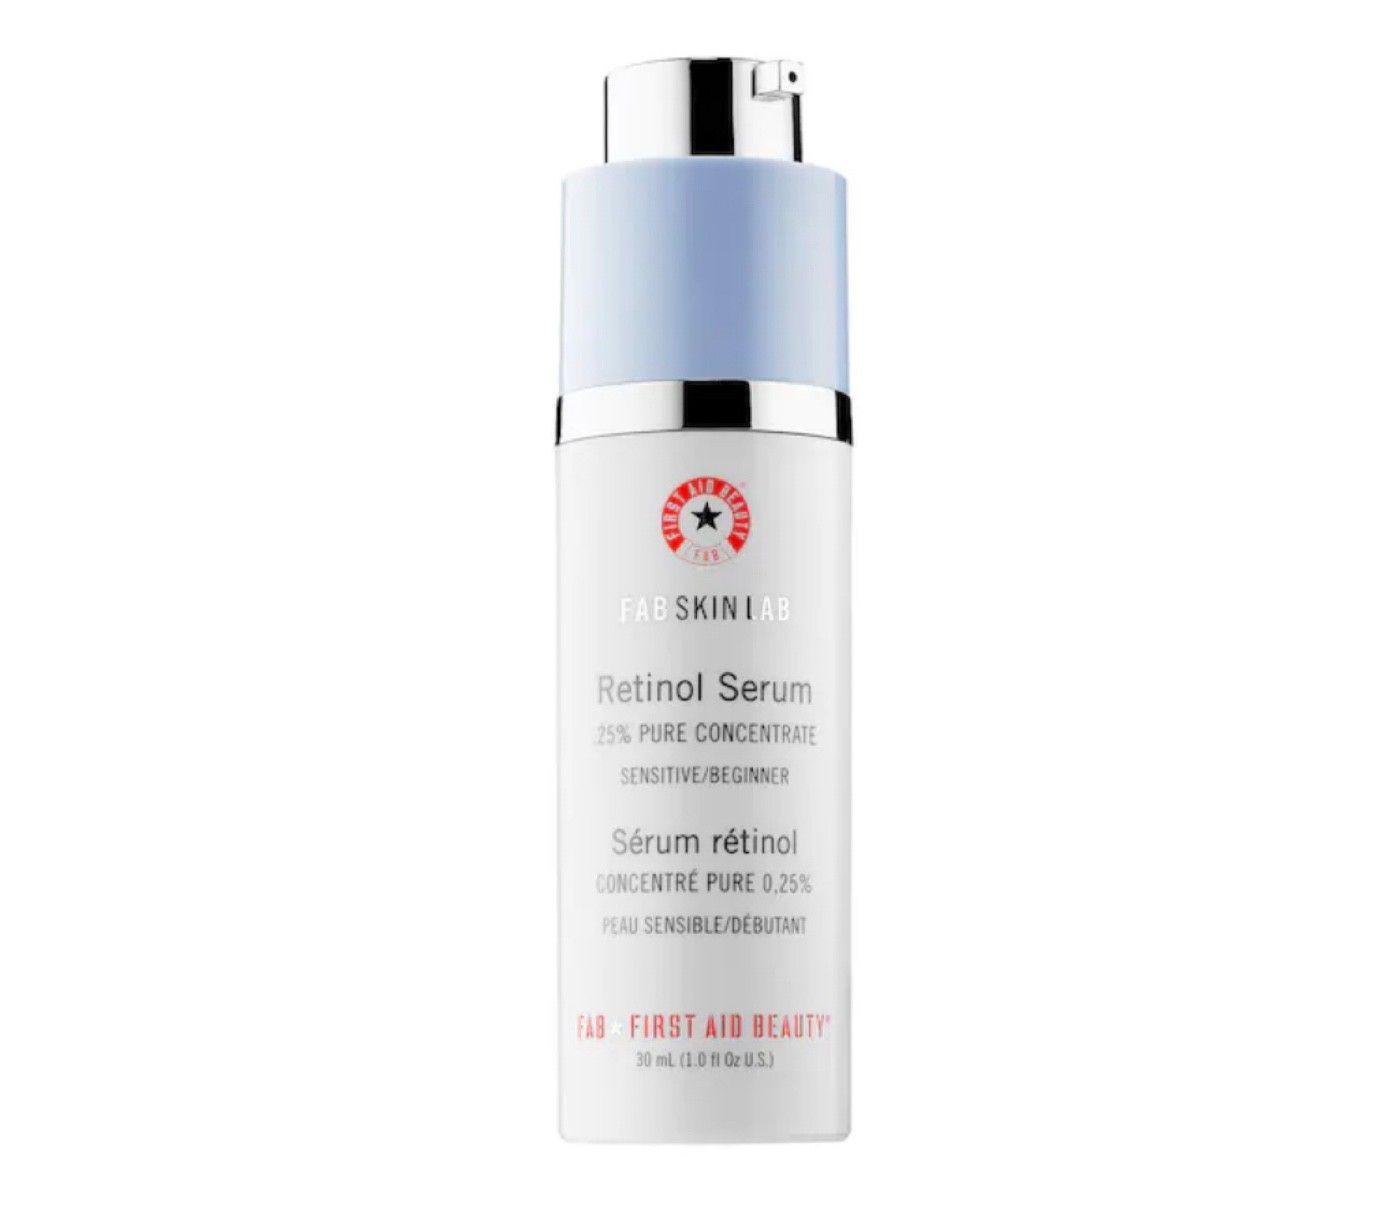 First Aid Beauty Retinol serum